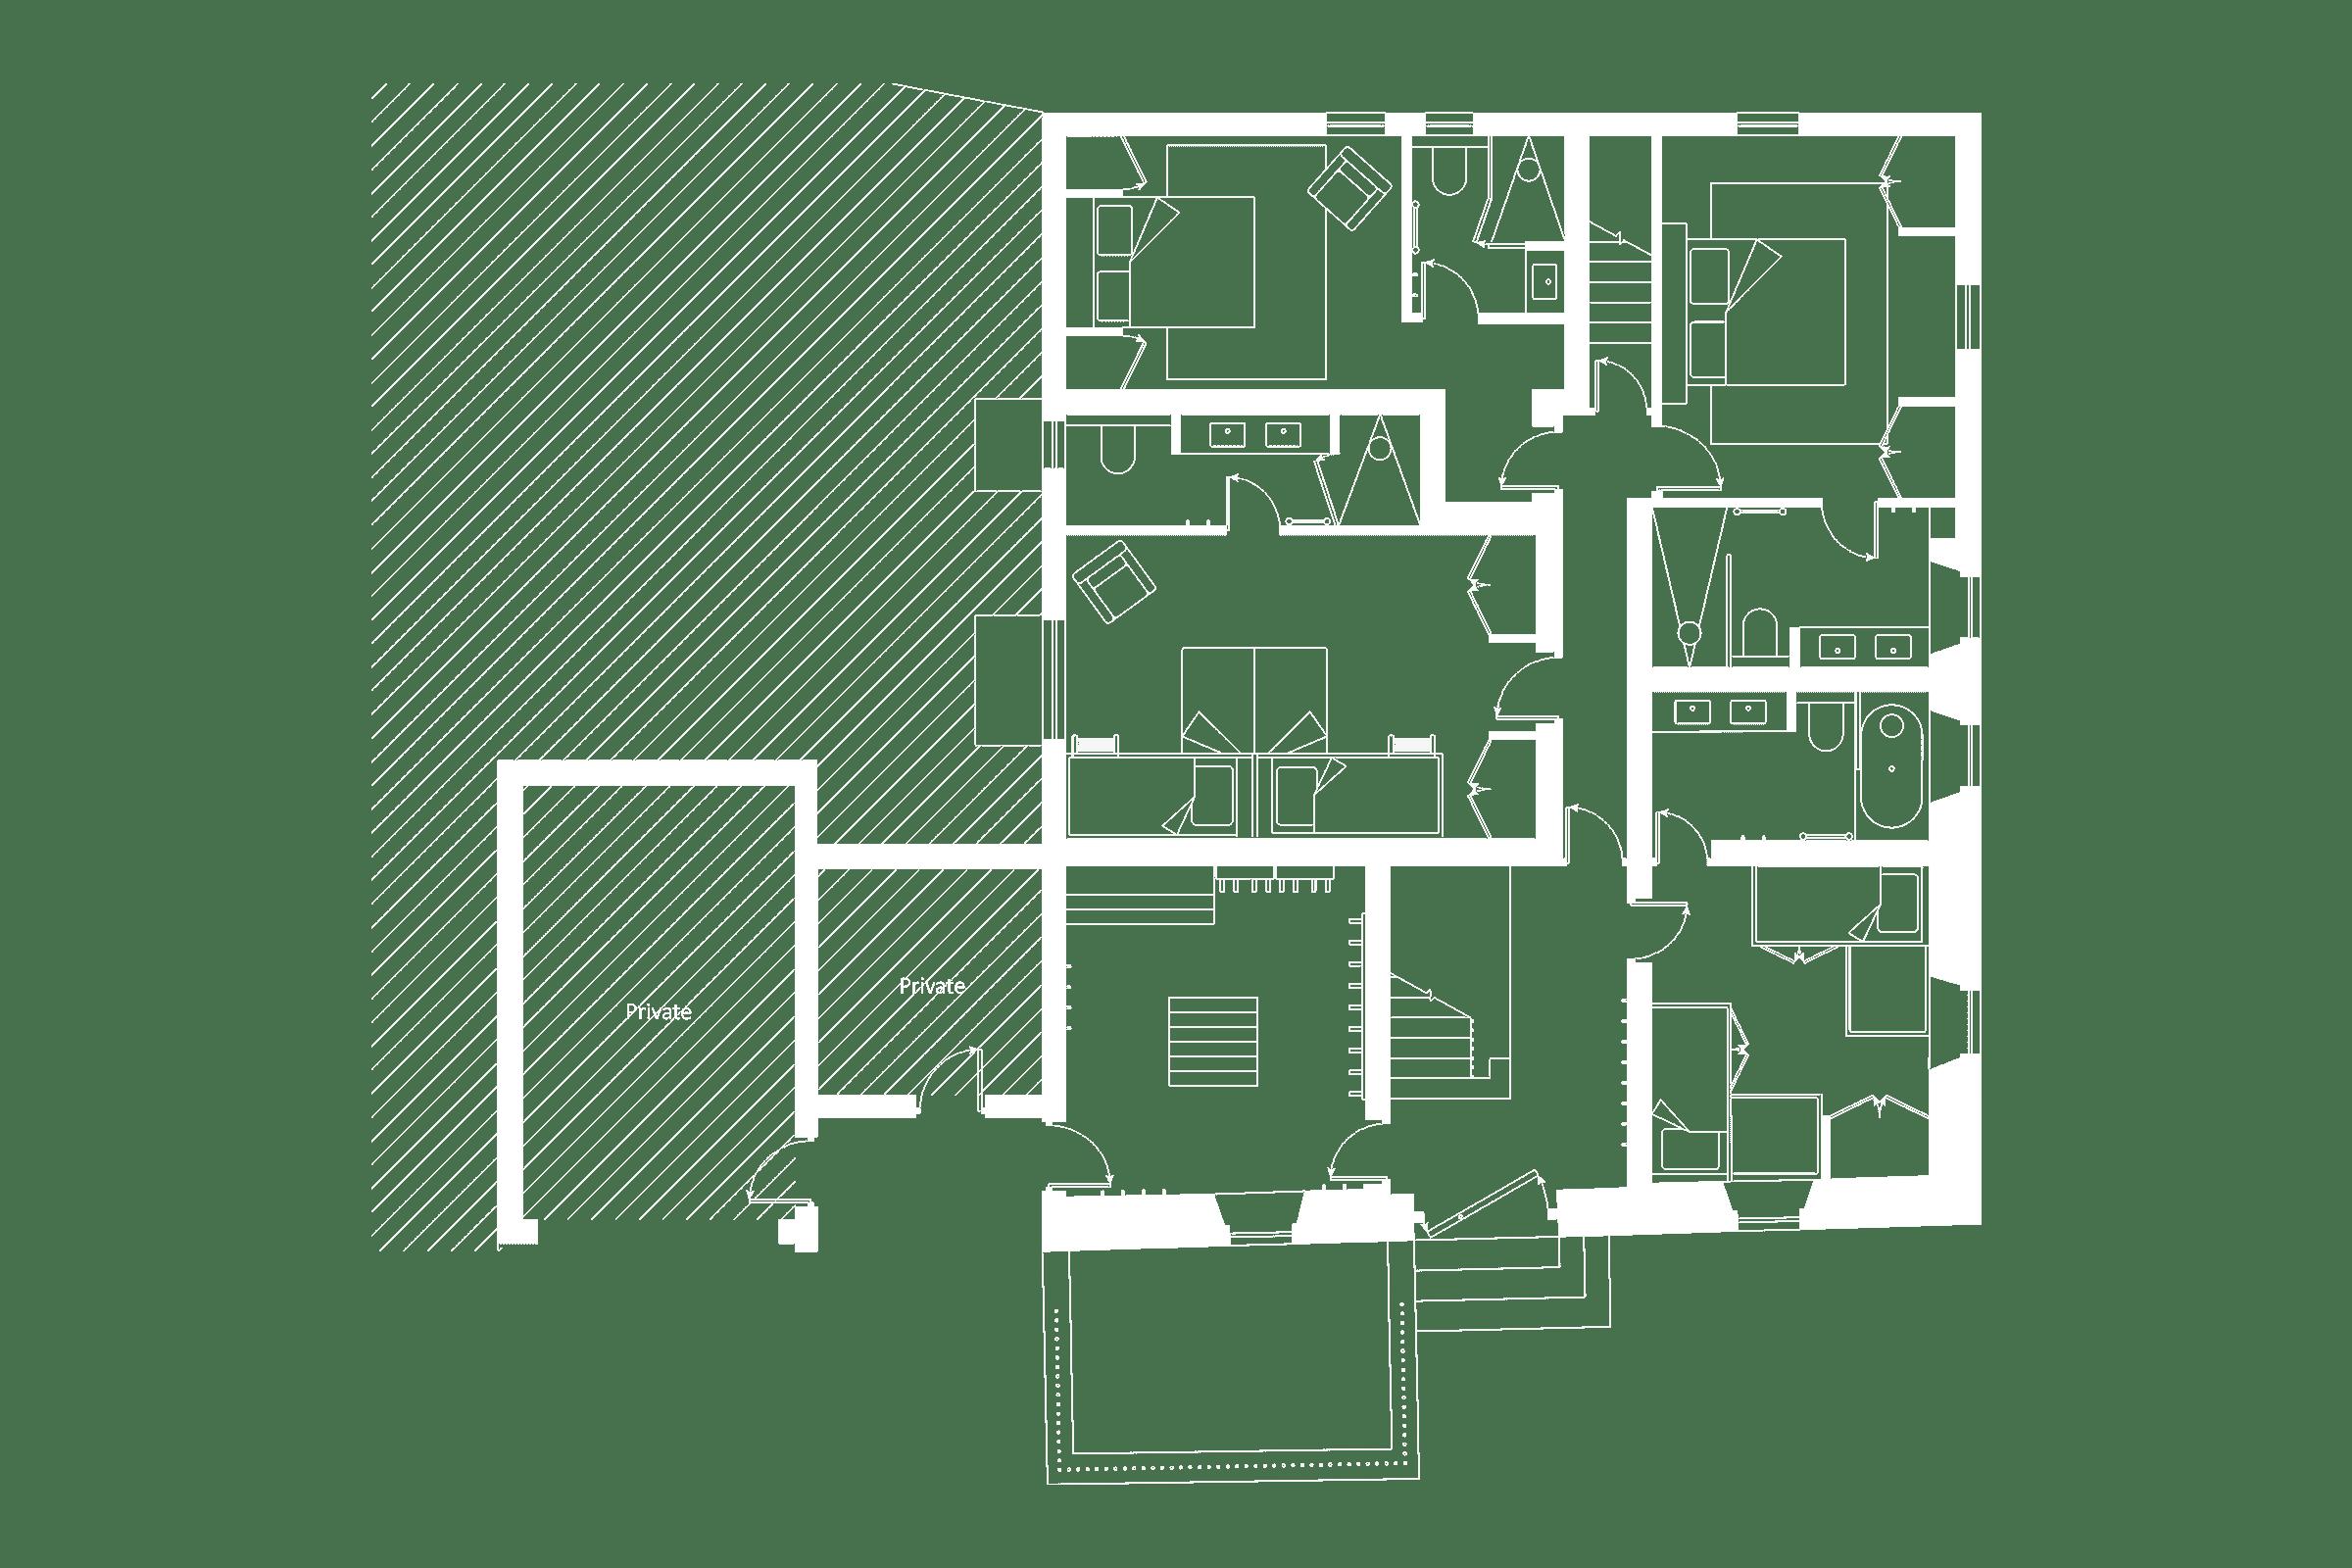 FF_Floorplans-04